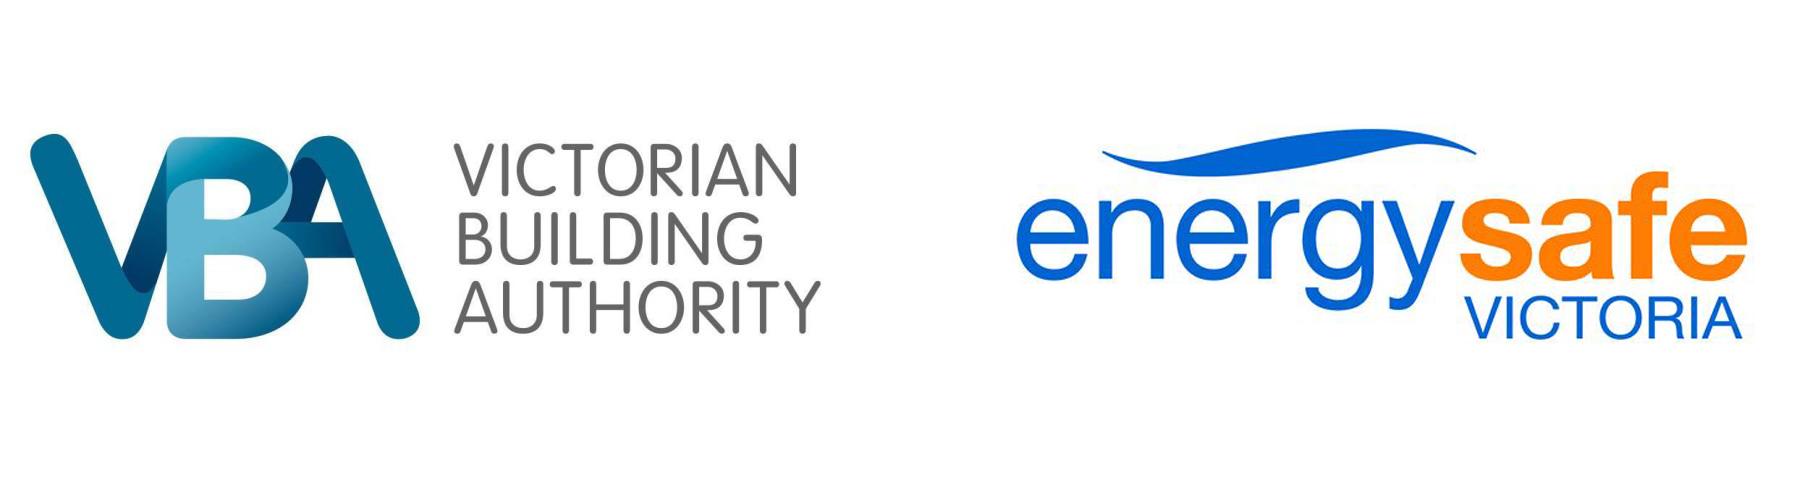 Regulator logos